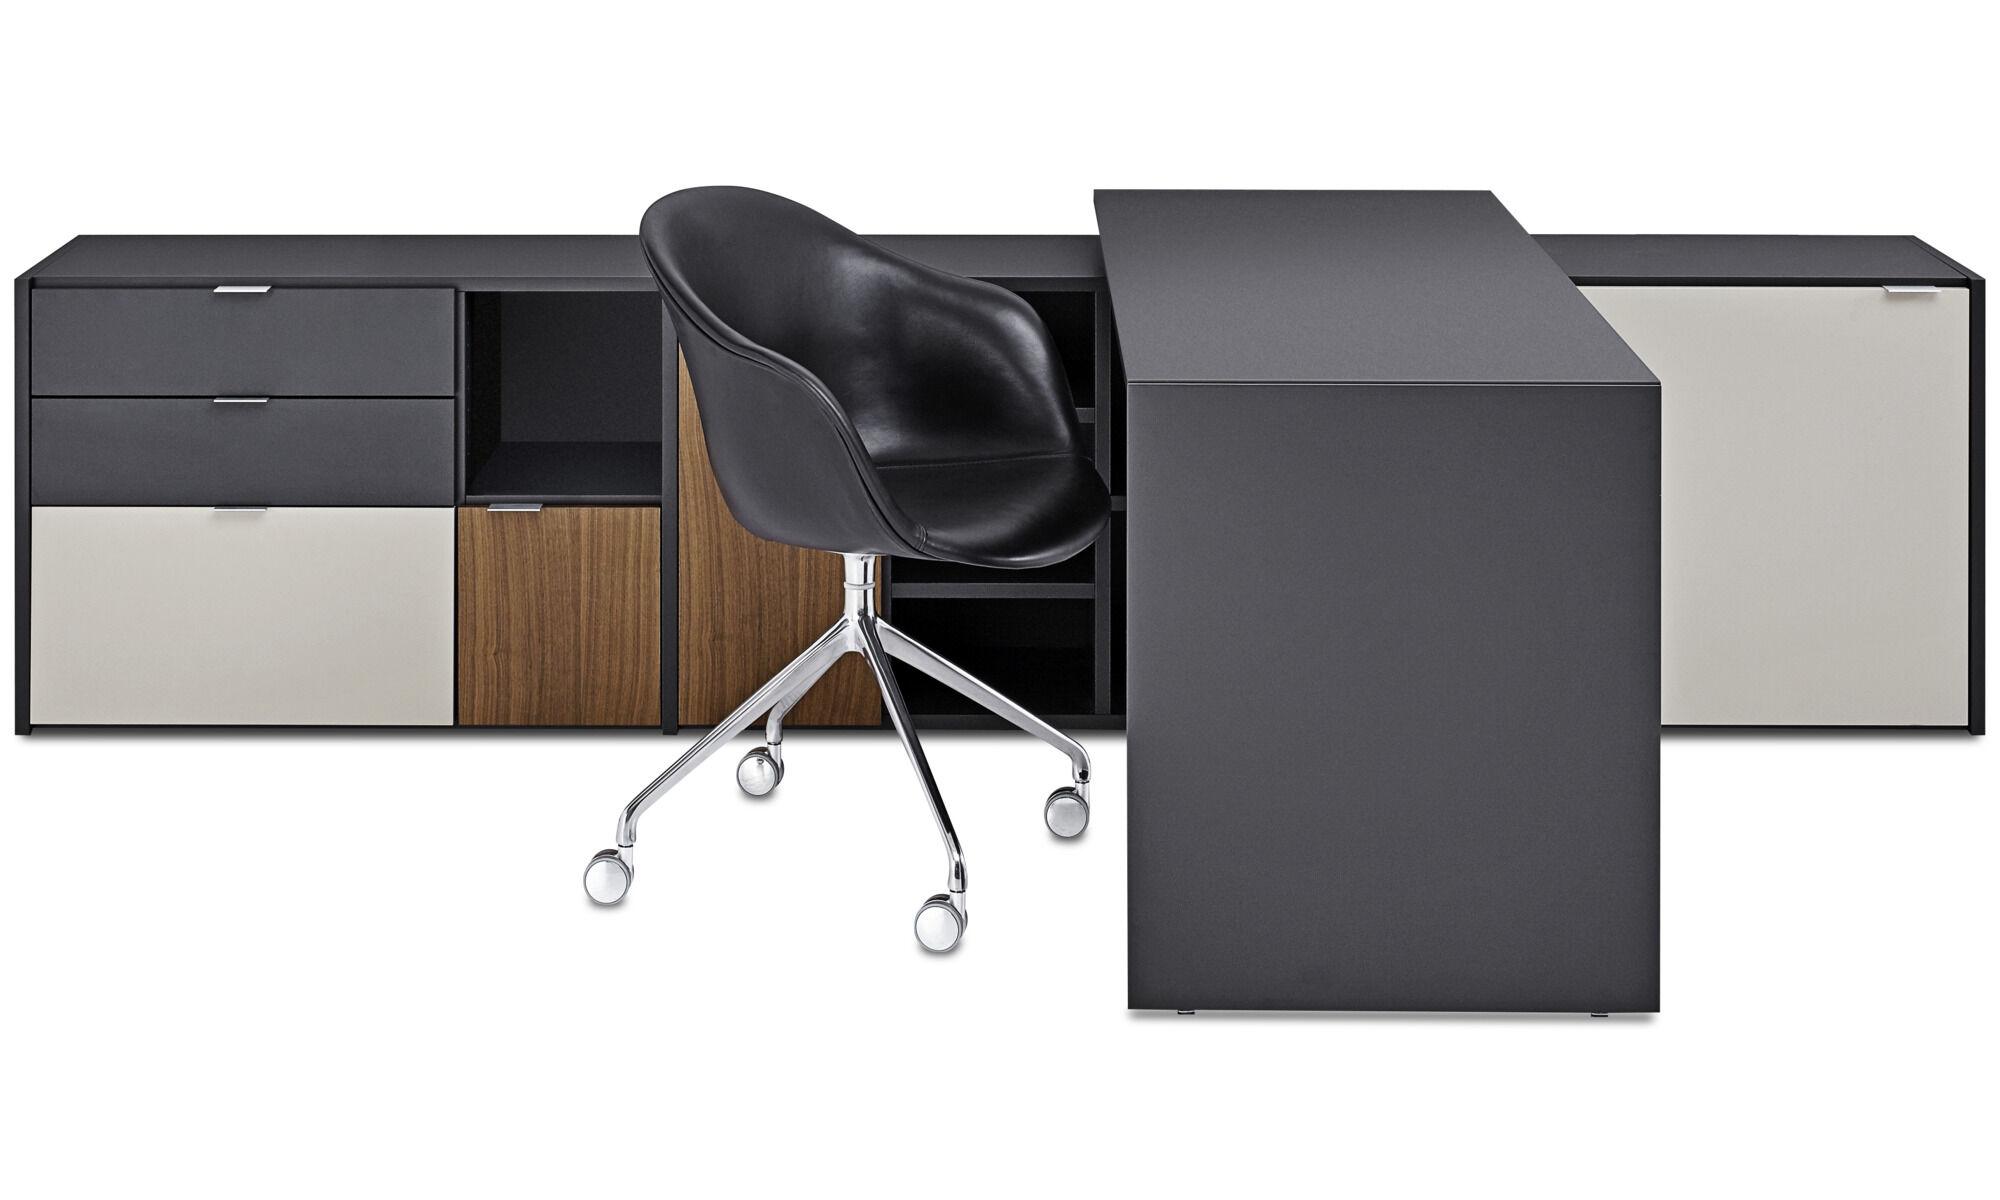 Office Desk Pictures Executive Desks Copenhagen Office System Grey Lacquered Cubicles Modern Desks Contemporary Design From Boconcept